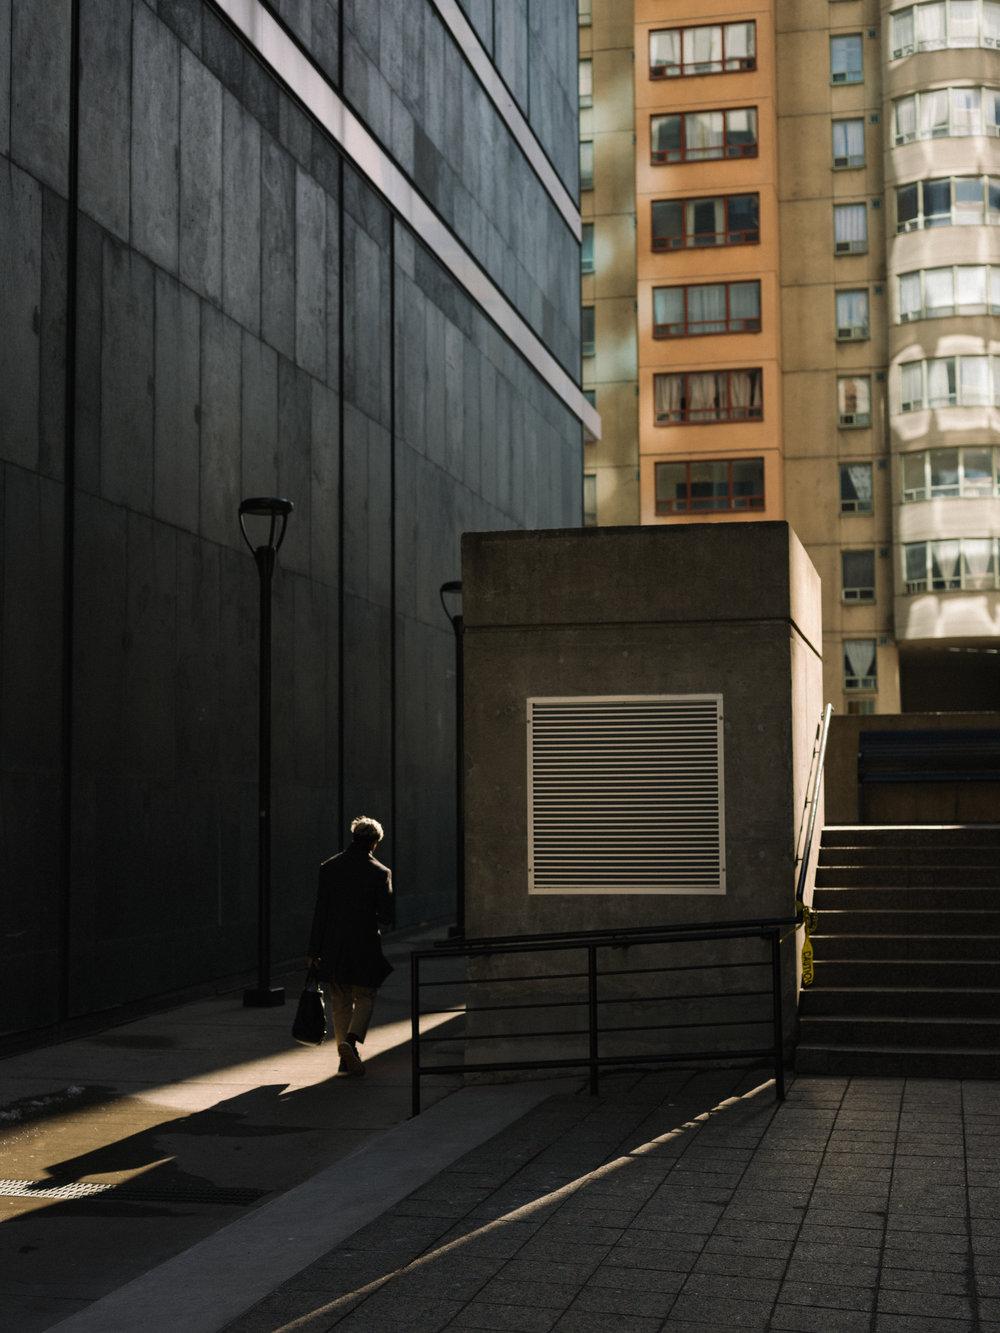 gfx50s fujifilm street photography toronto.jpg